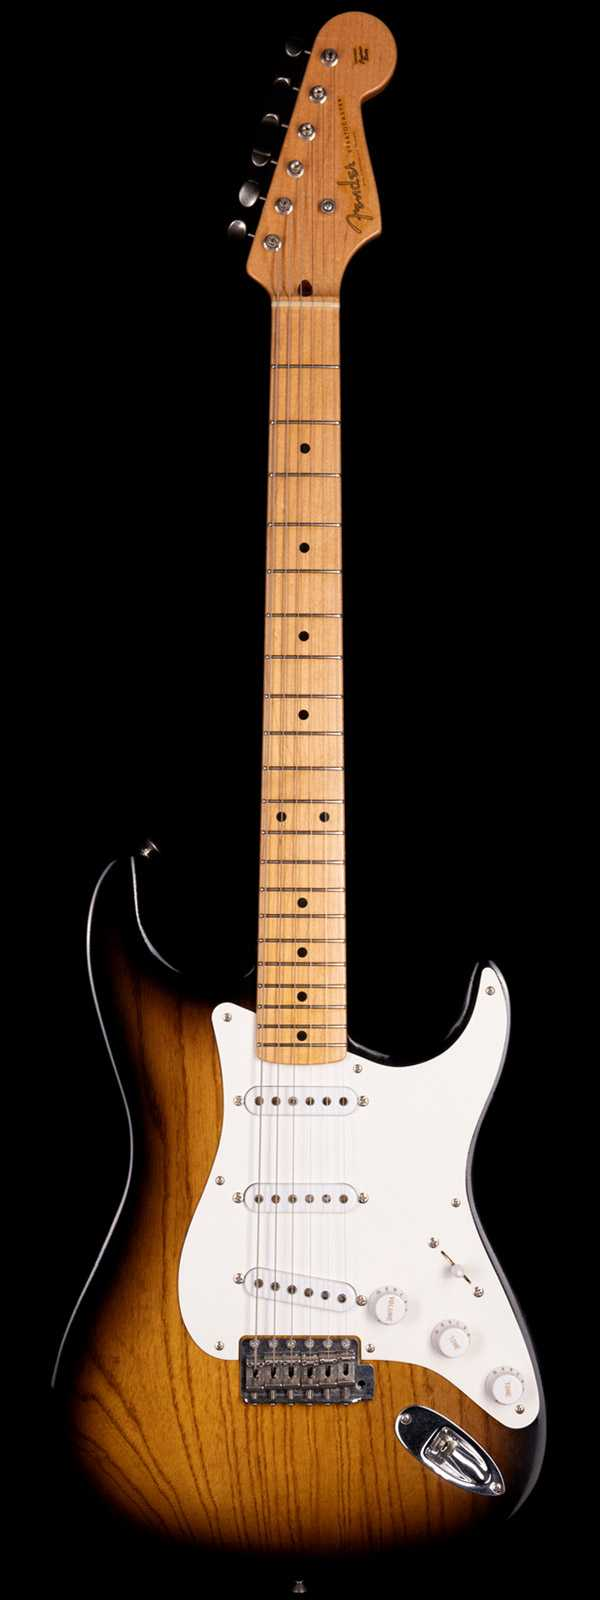 Fender Custom Shop 2004 Masterbuilt Yuriy Shishkov 1954 50th Anniversary Stratocaster Relic 2-Tone Sunburst